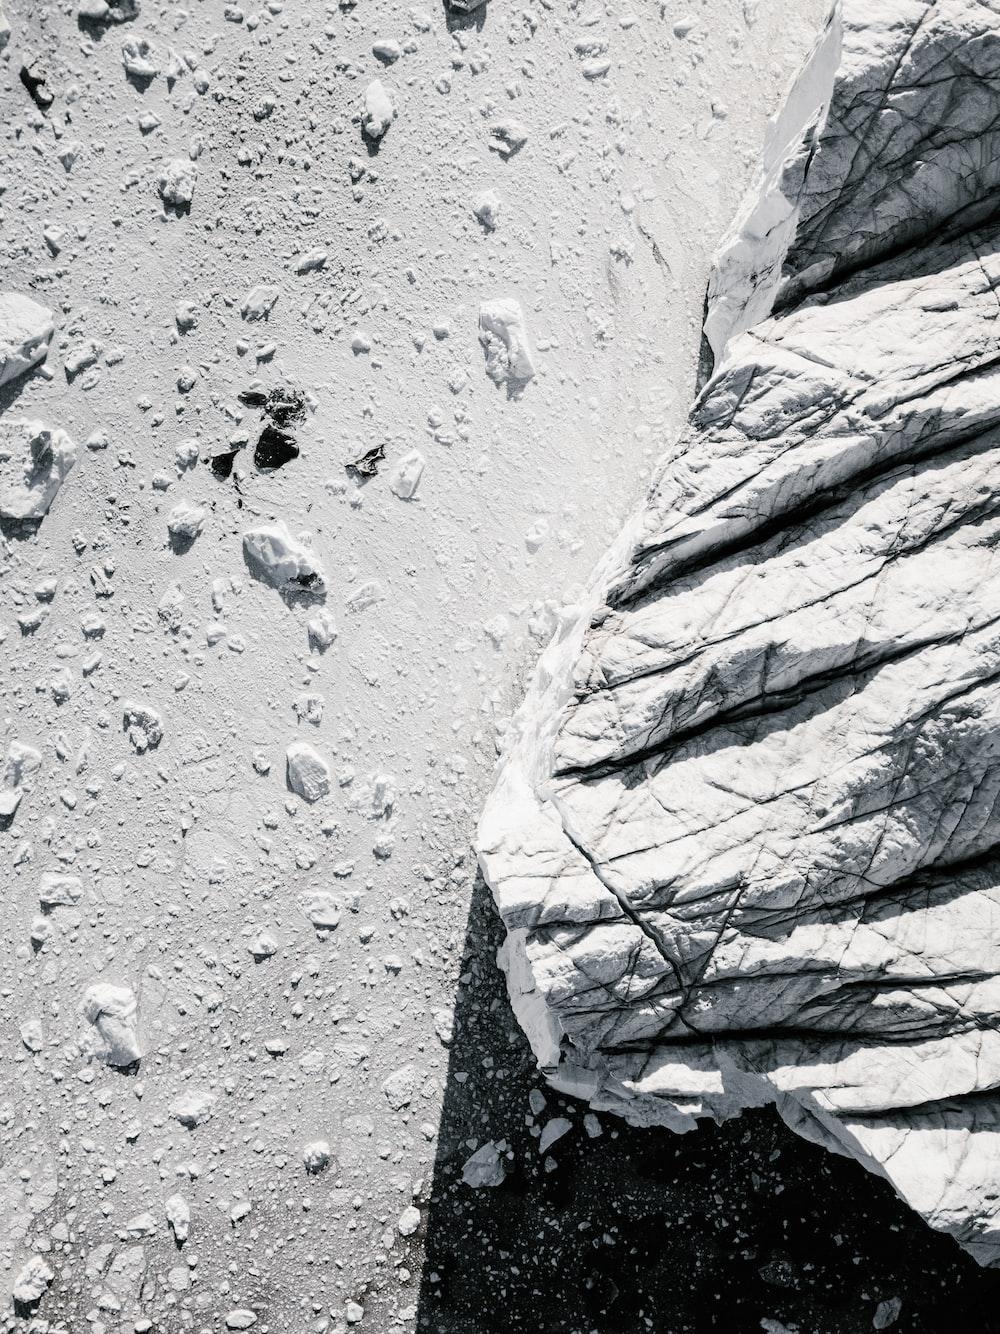 white stone with snows